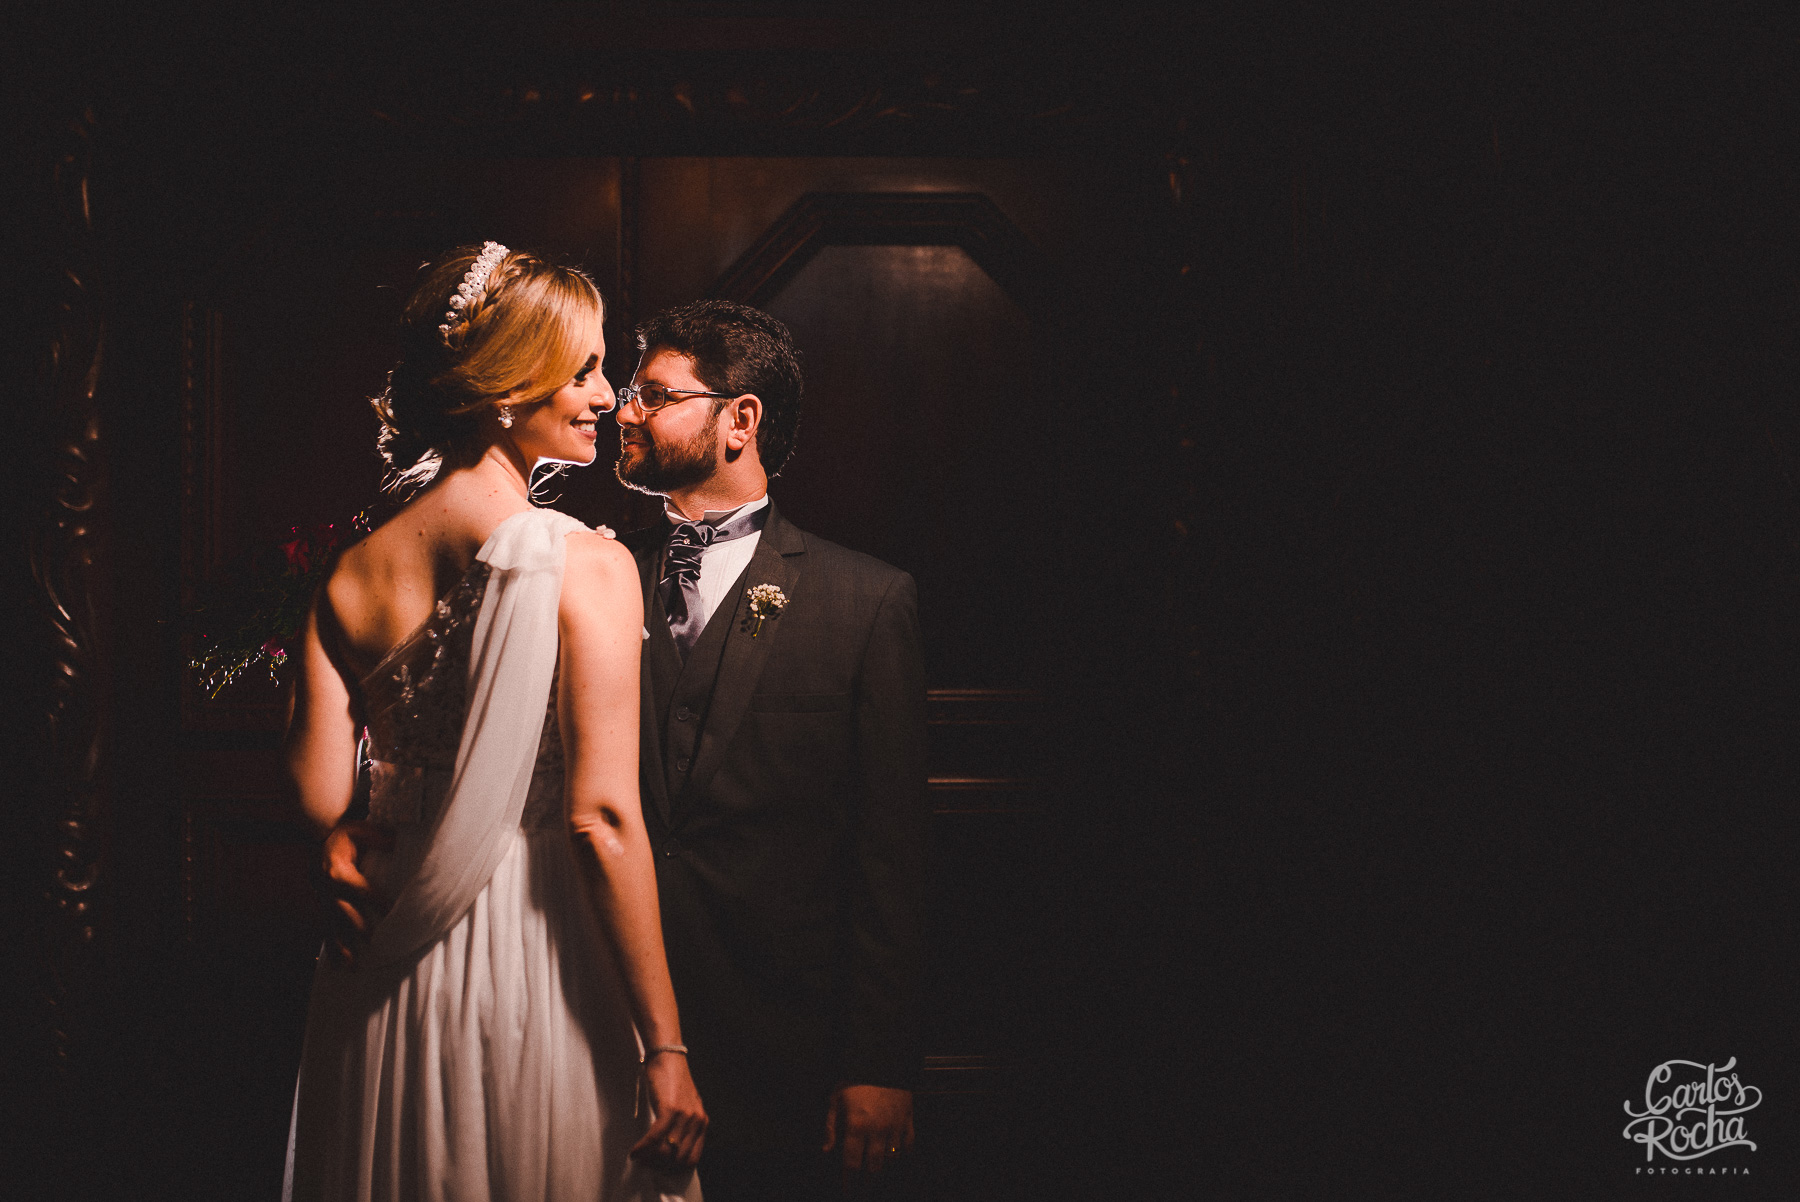 carlos rocha fotografia casamento